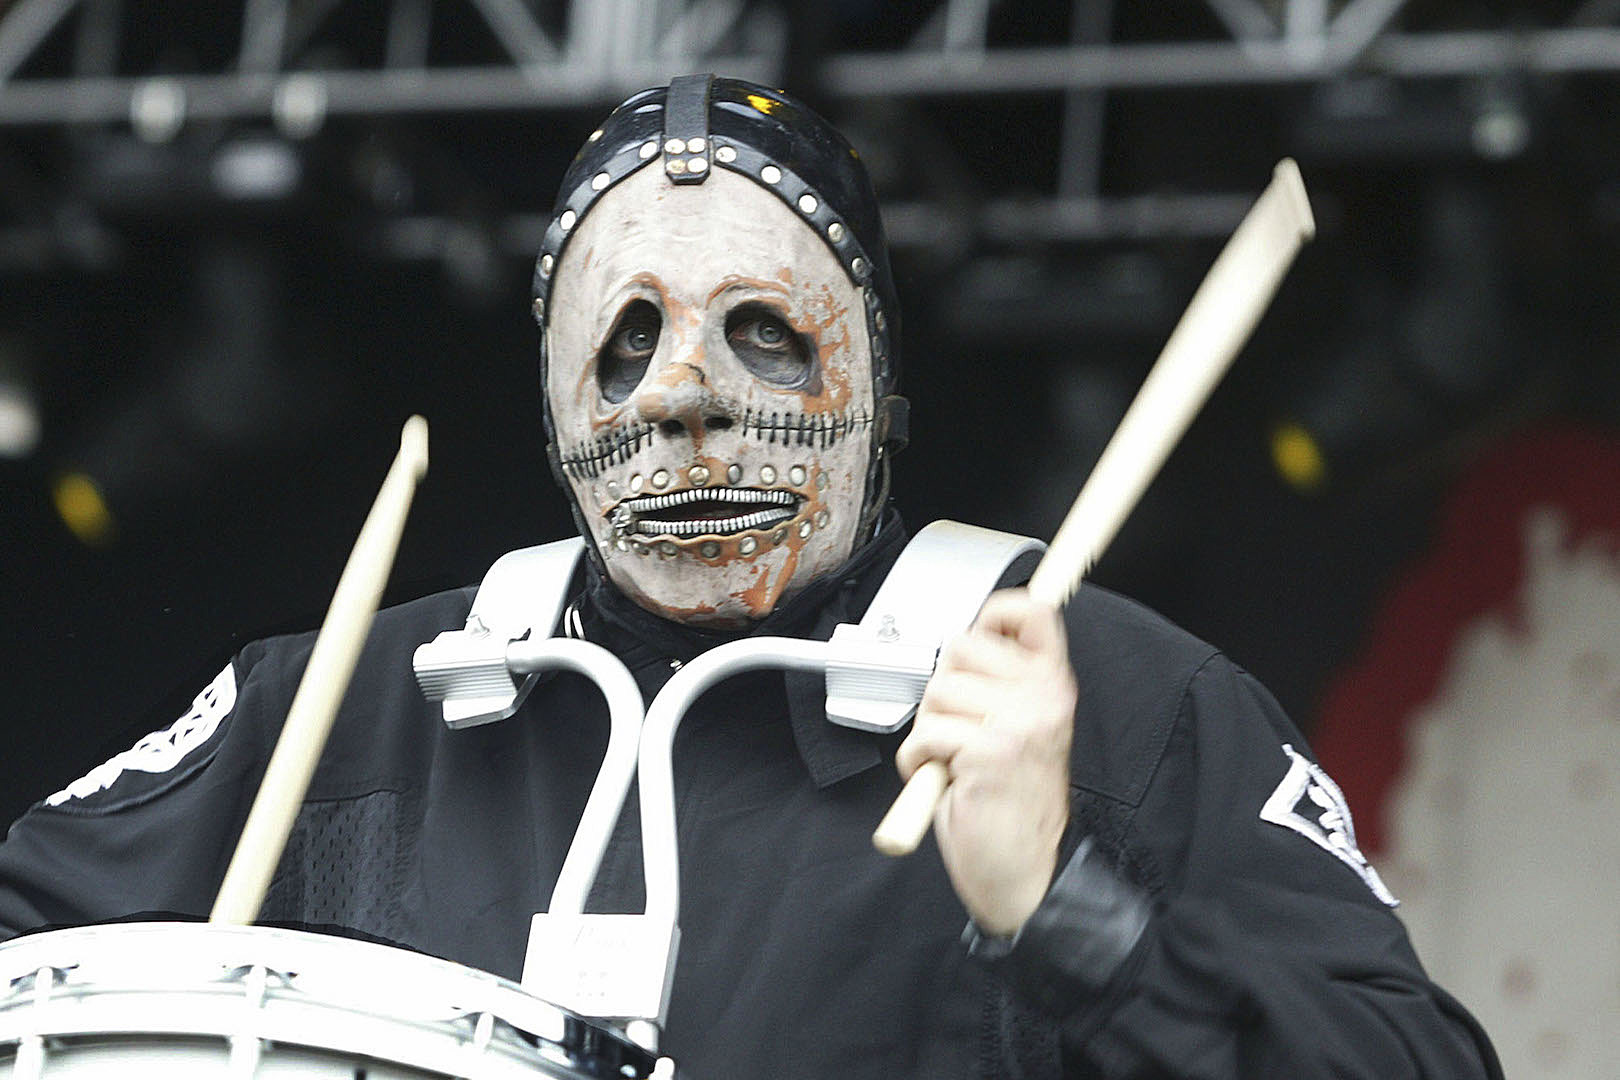 Chris Fehn Still Employed by Slipknot, Says Lawyer